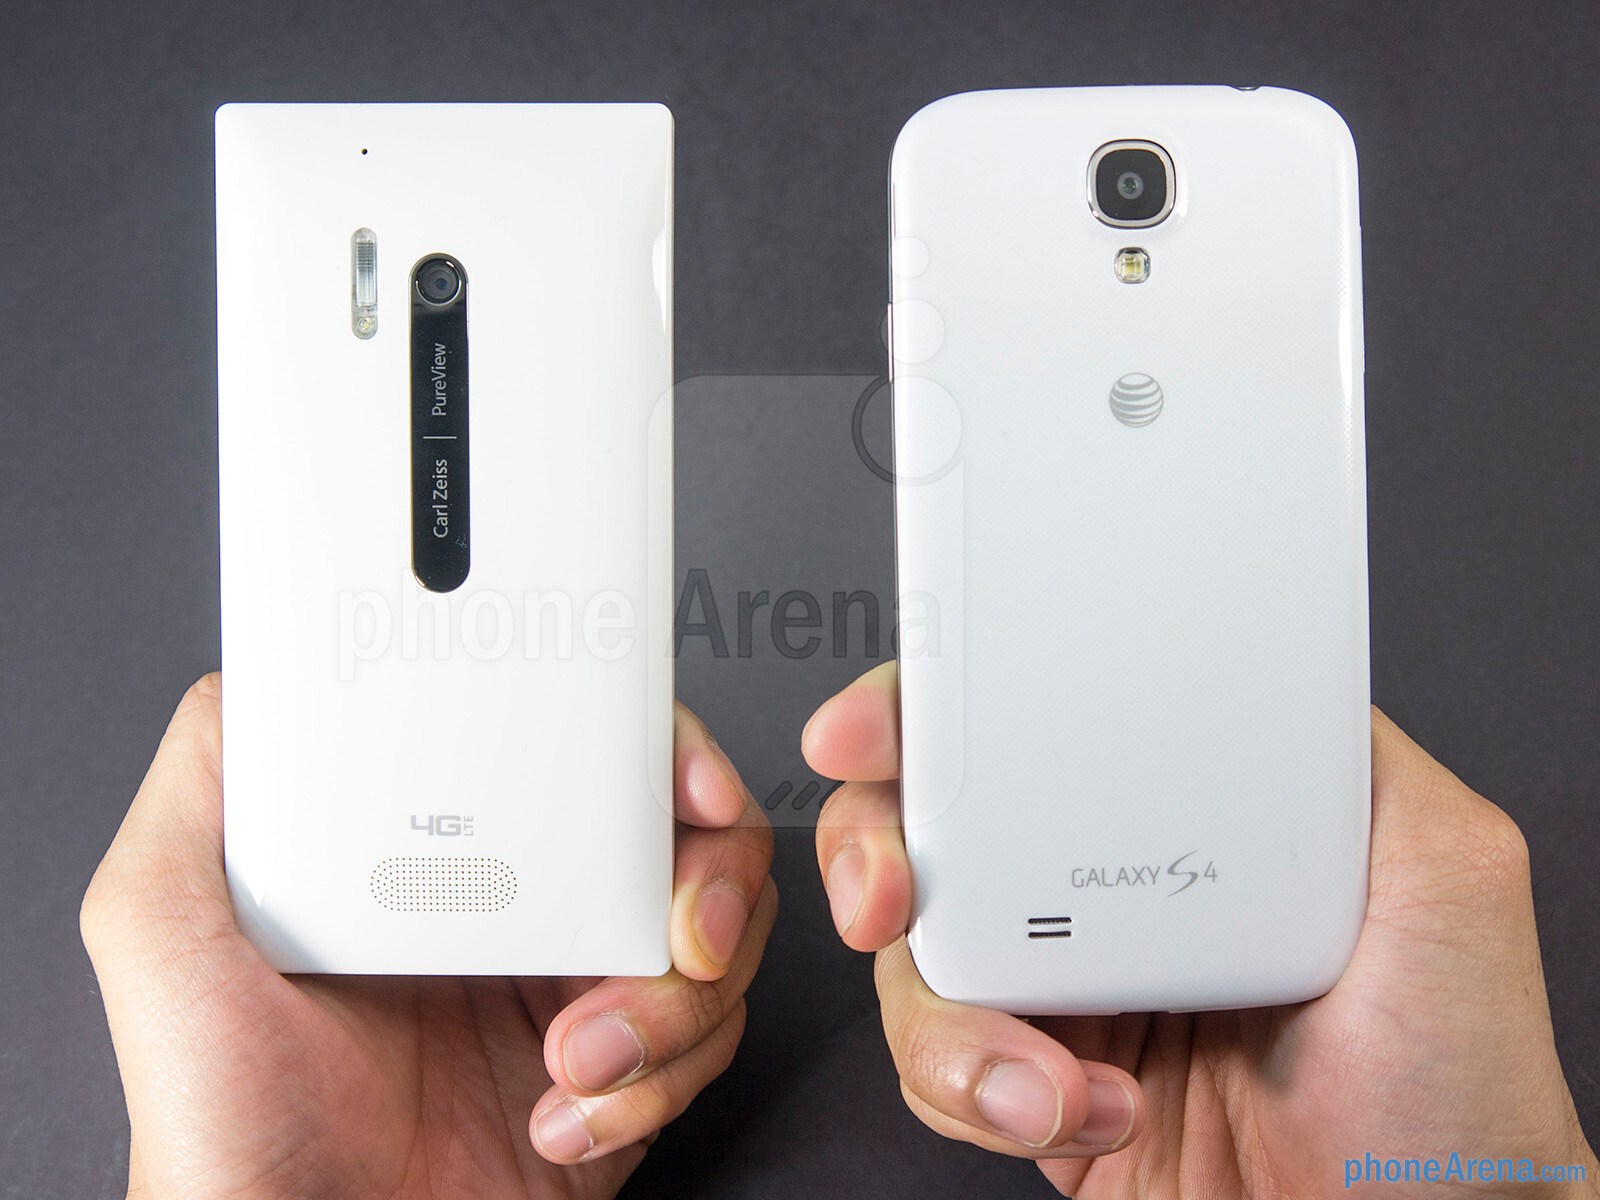 Nokia Lumia 928 Specification The Nokia Lumia 928 Left And